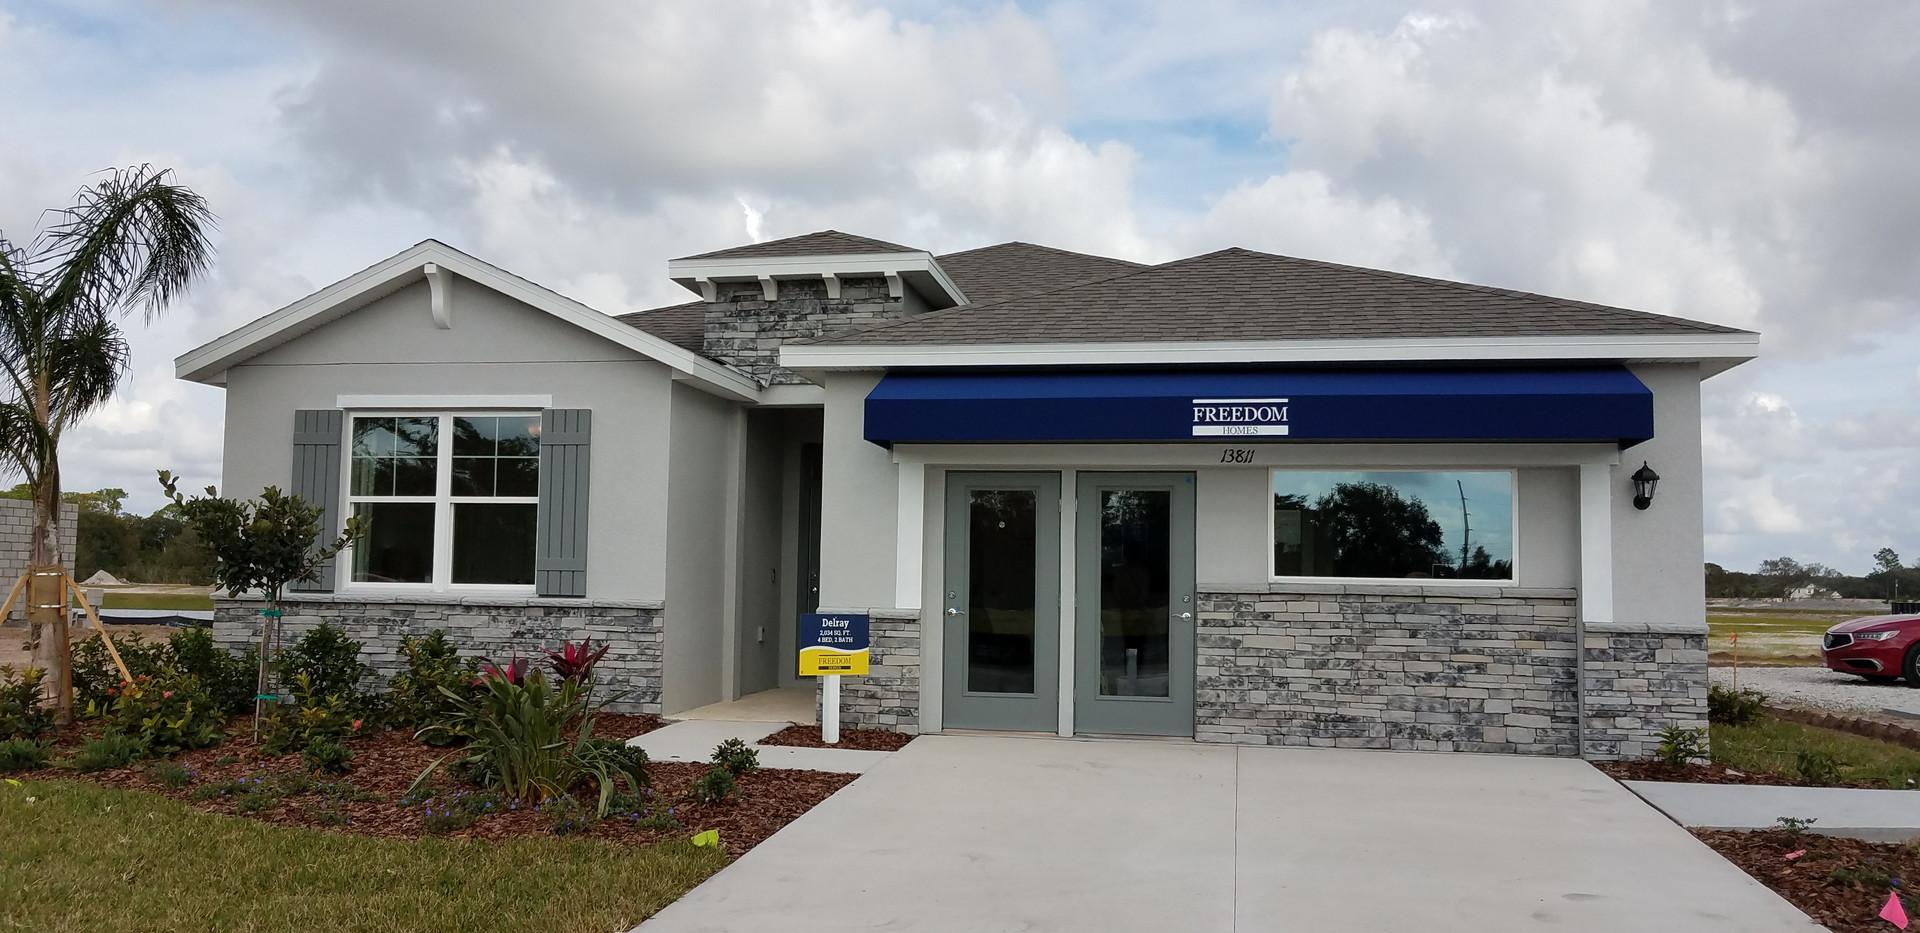 The Palisades Lakewood Ranch model home